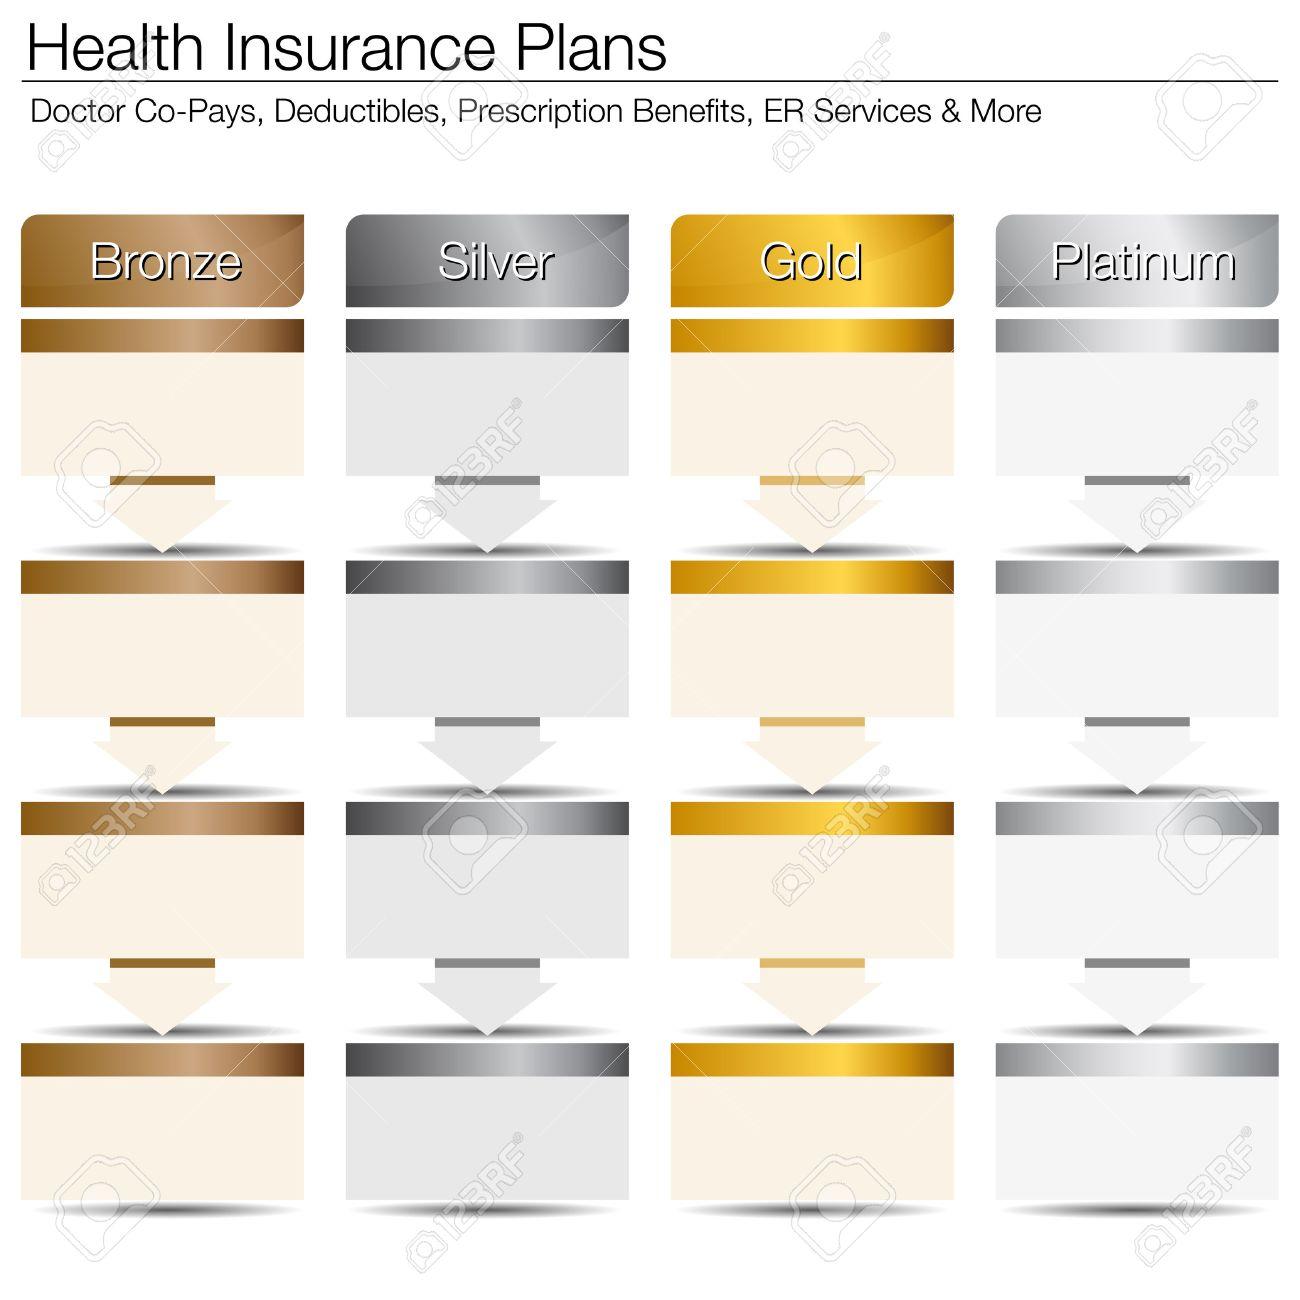 Health Insurance Plans >> An Image Of Health Insurance Plan Types Royalty Free Klipartlar